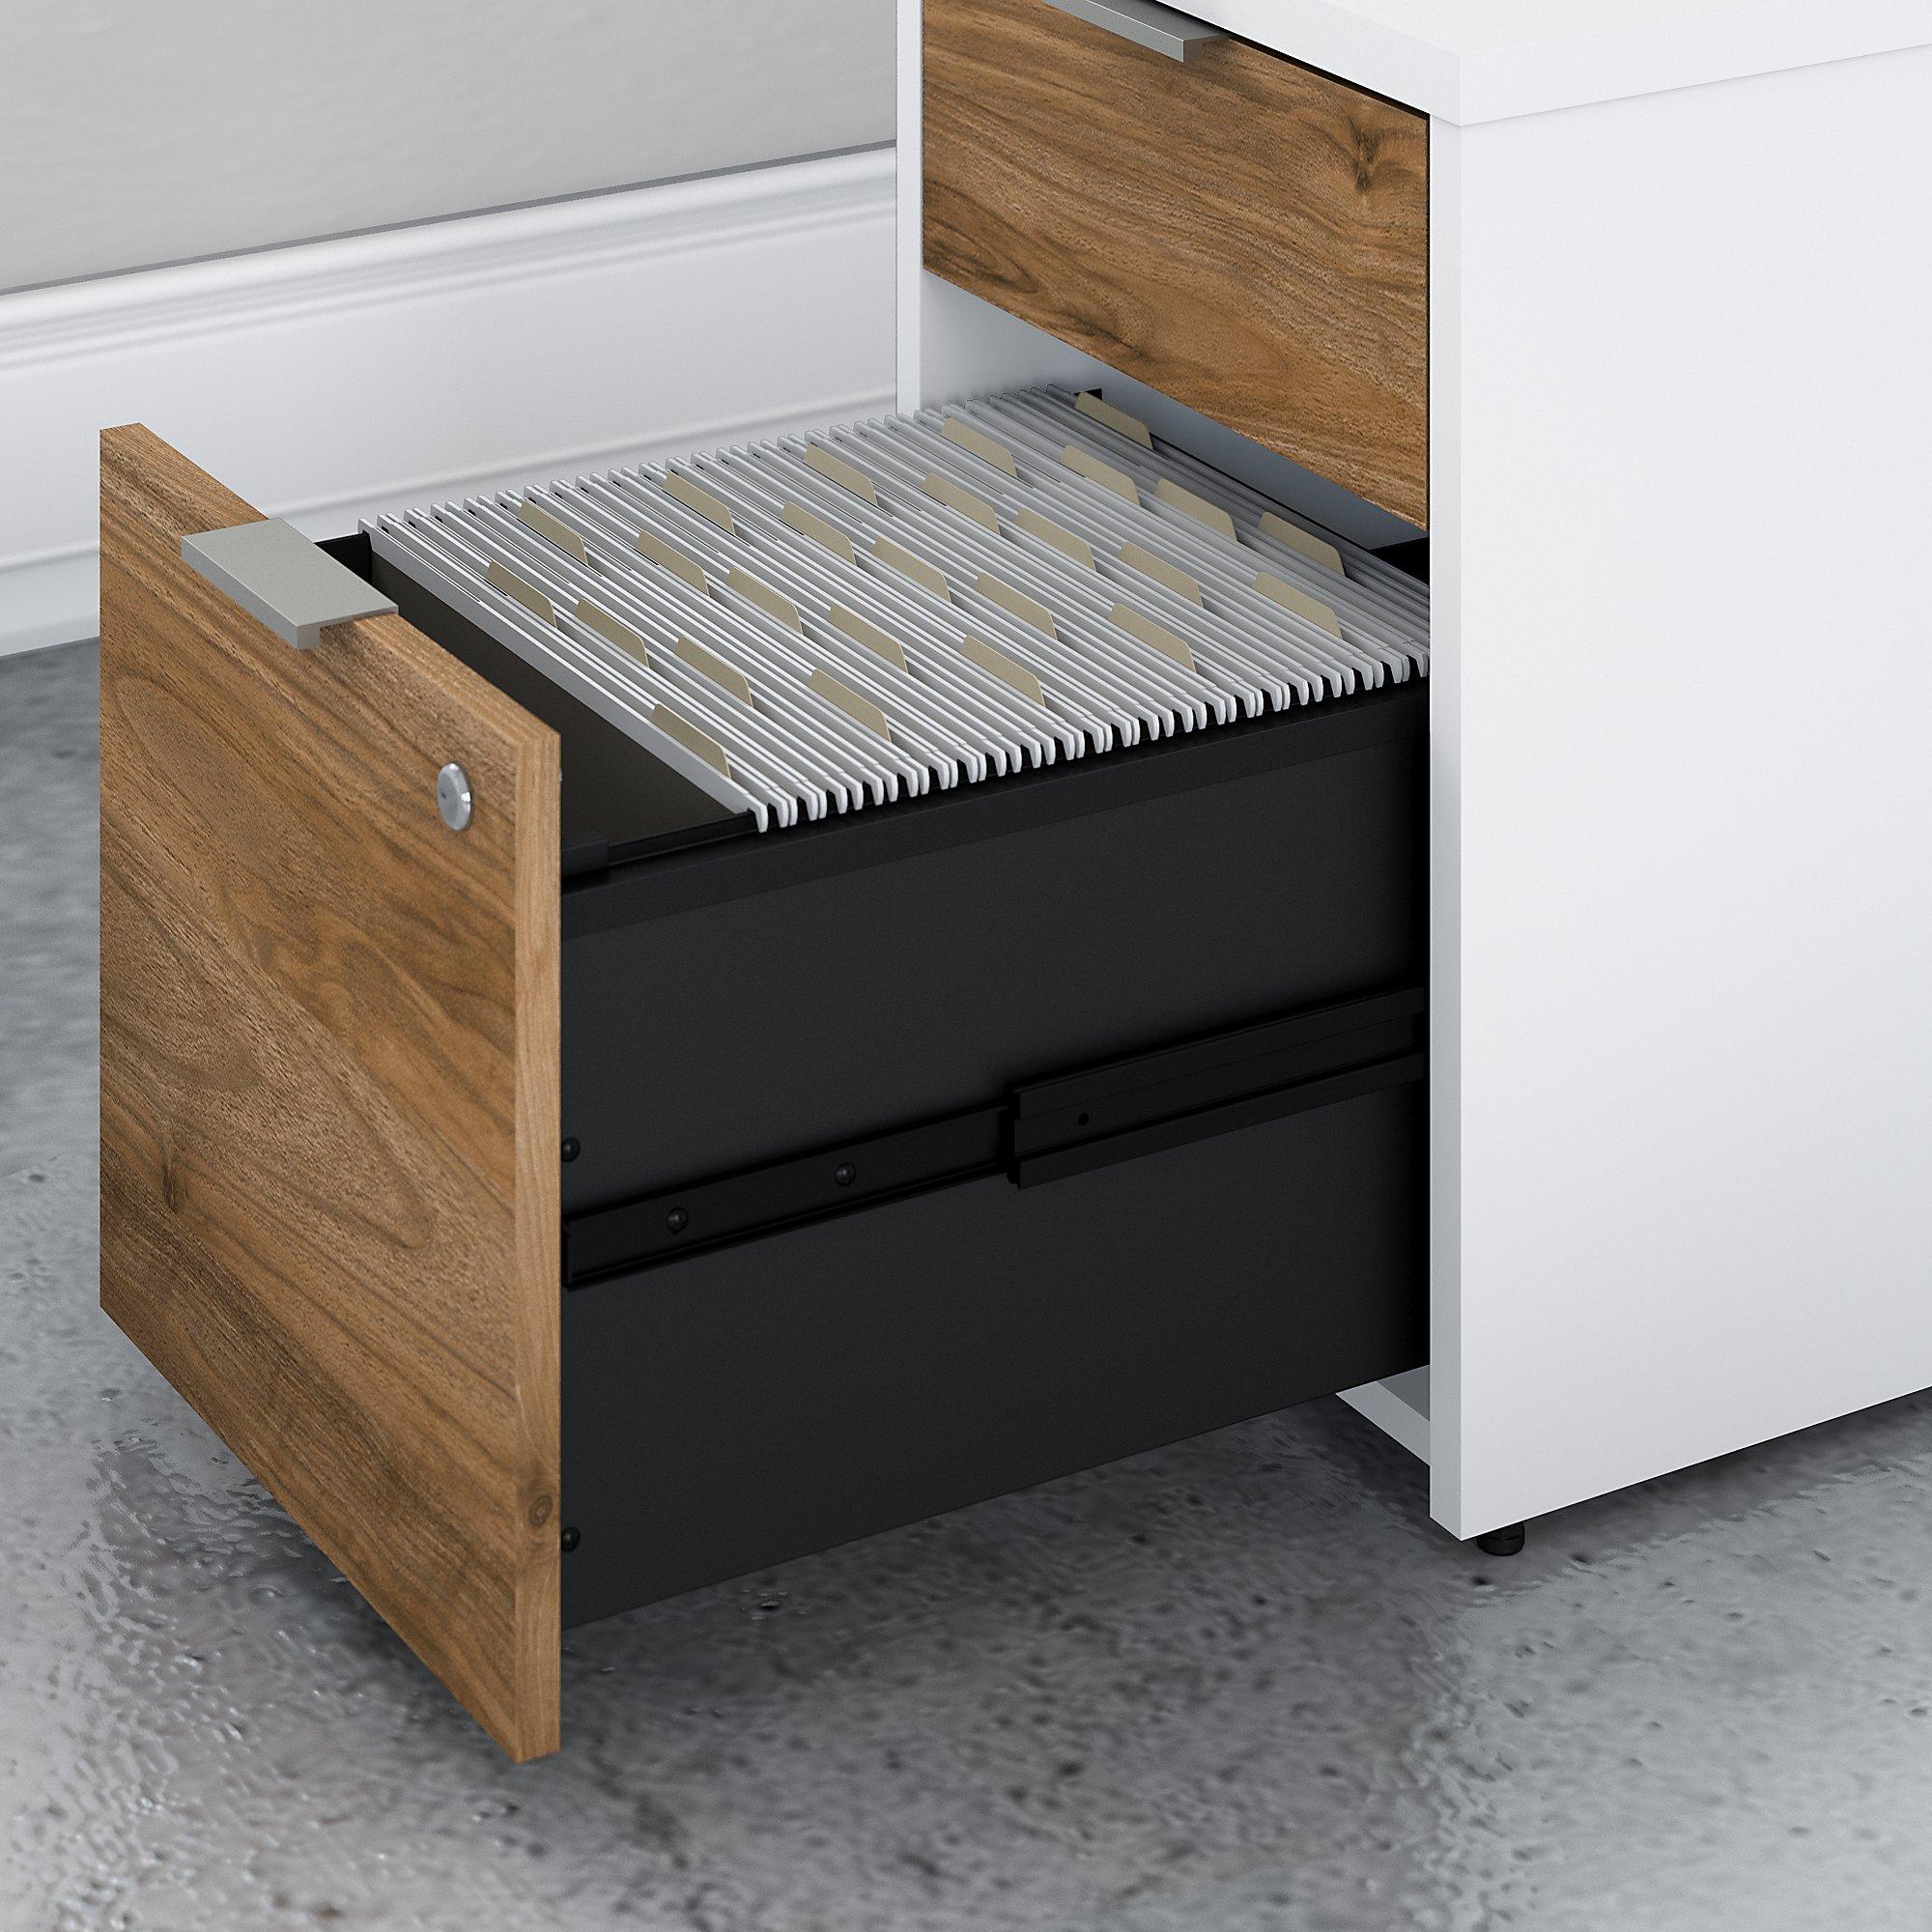 jamestown file drawer open